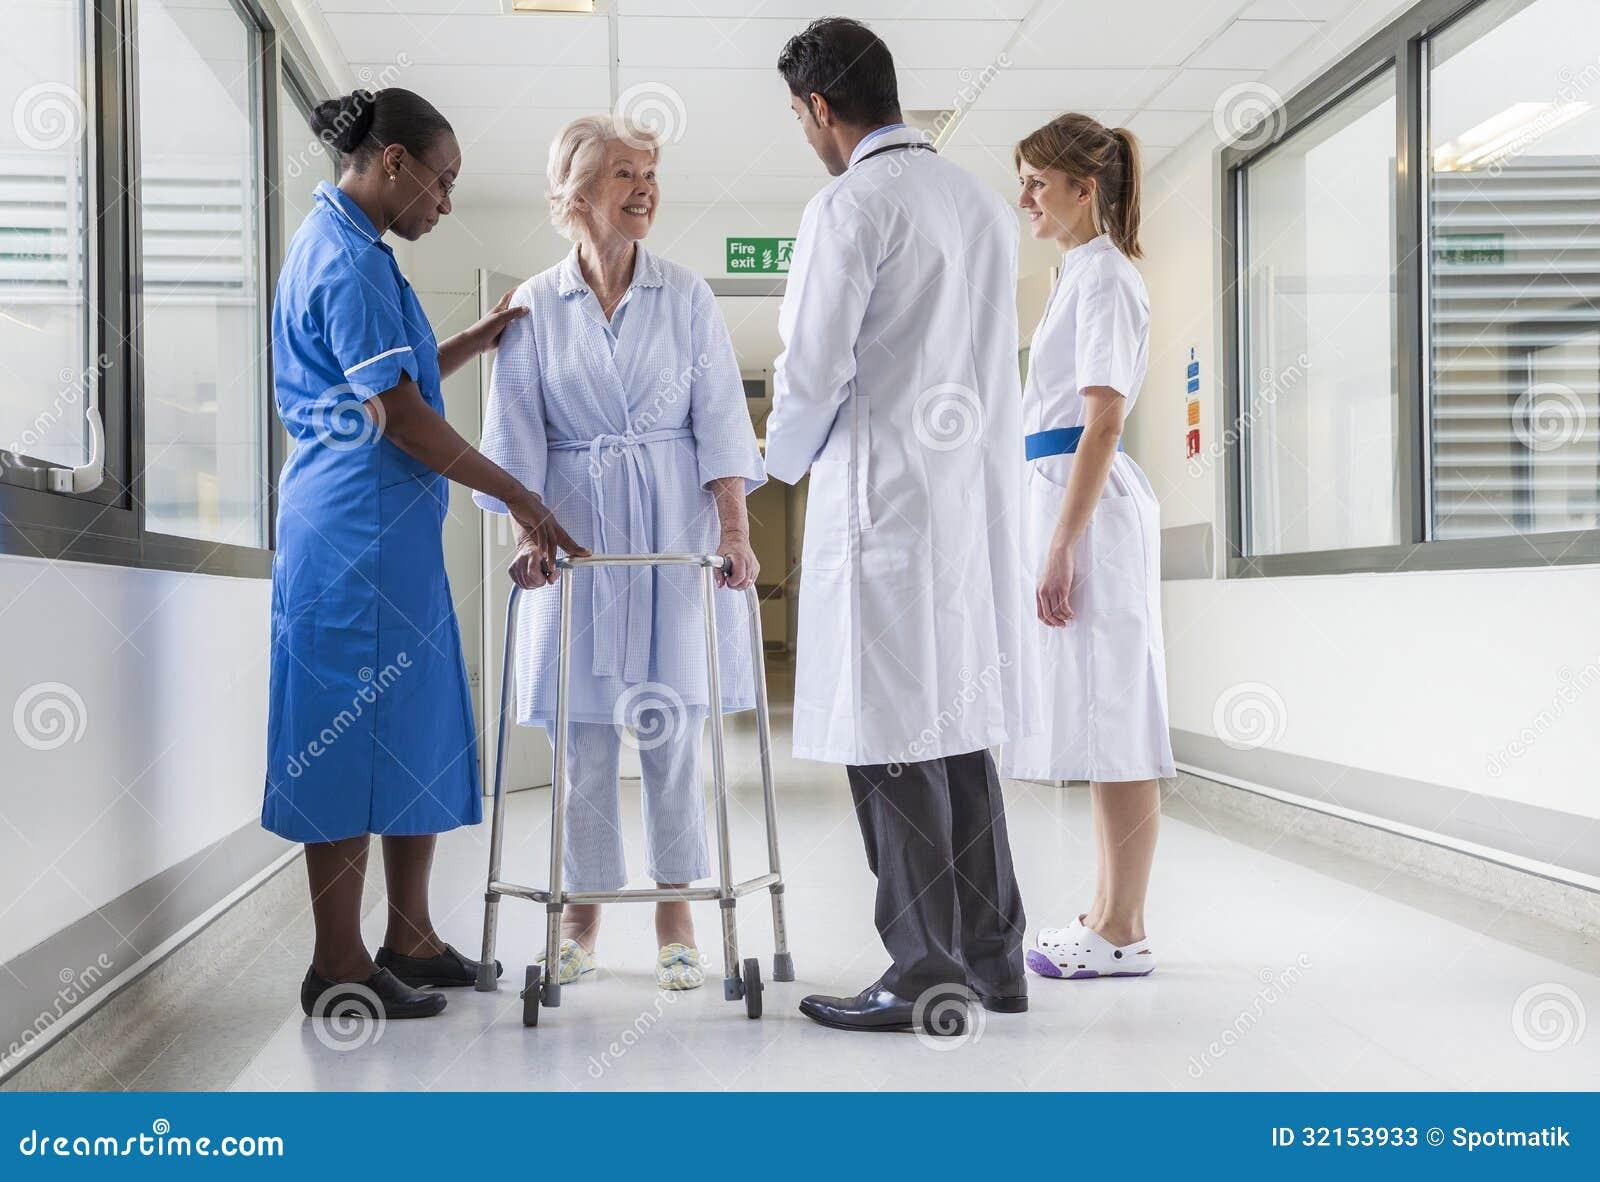 kay paggi  a professional geriatric care manger